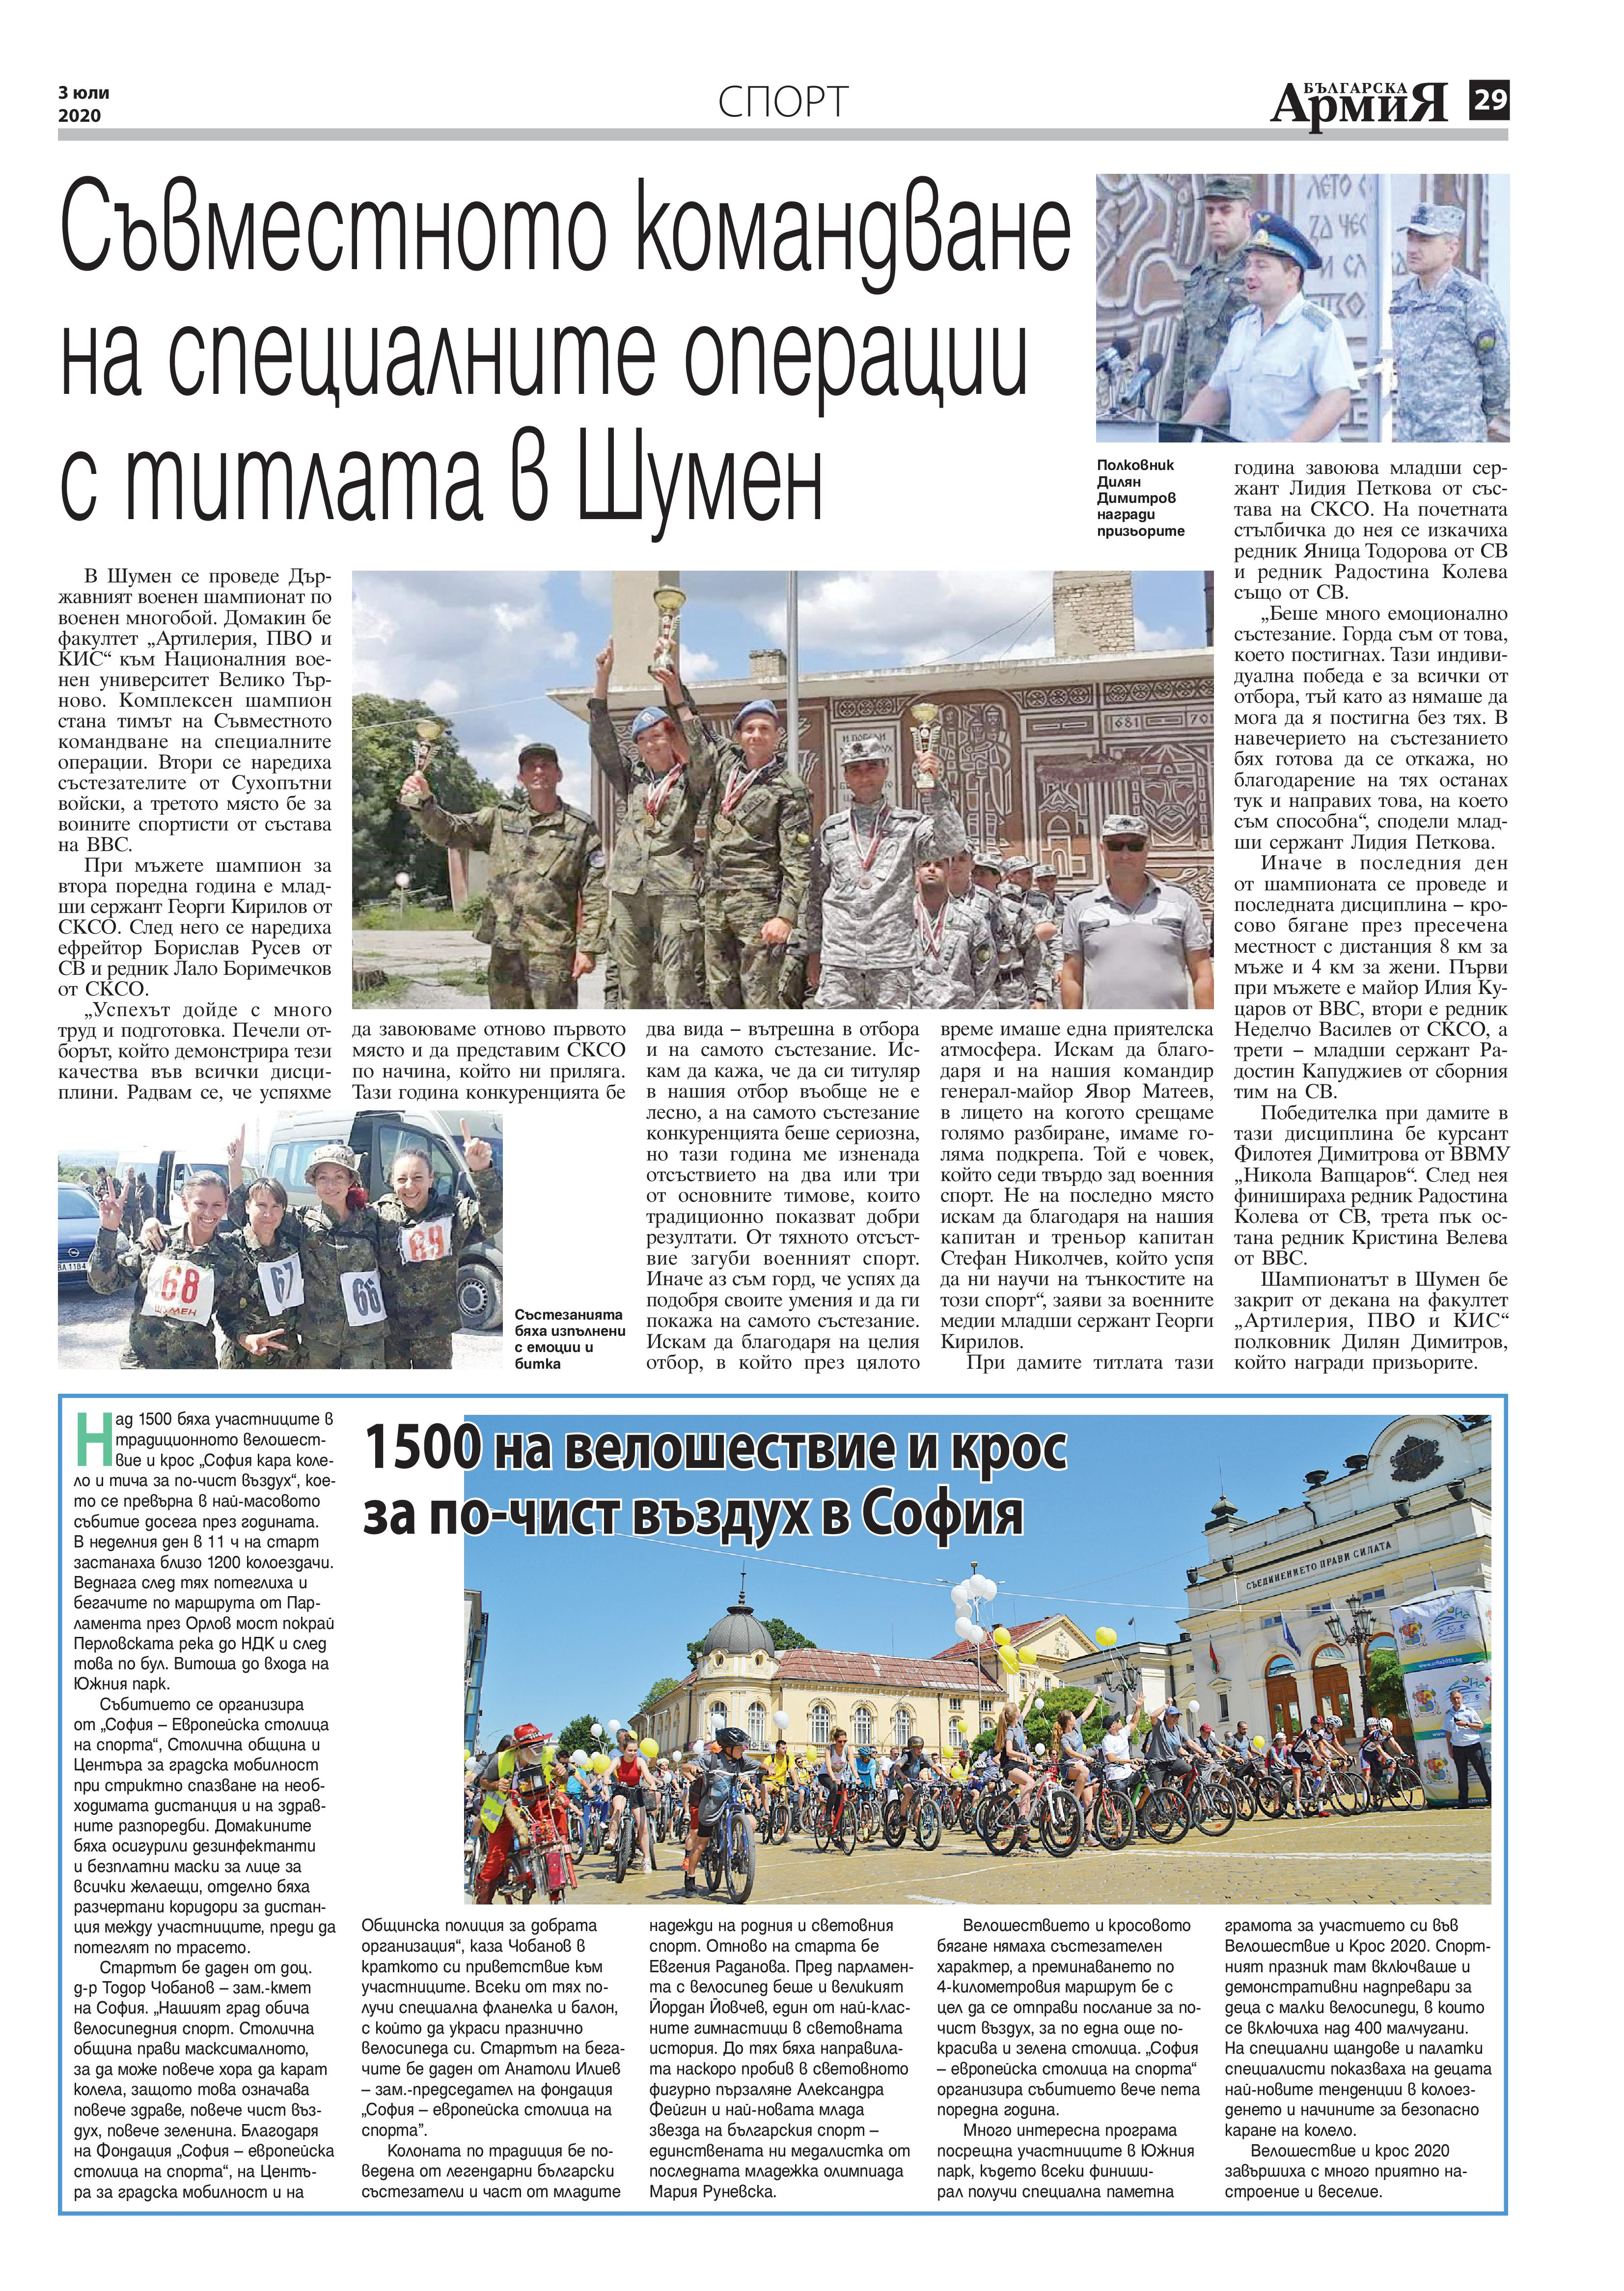 https://www.armymedia.bg/wp-content/uploads/2015/06/29-31.jpg